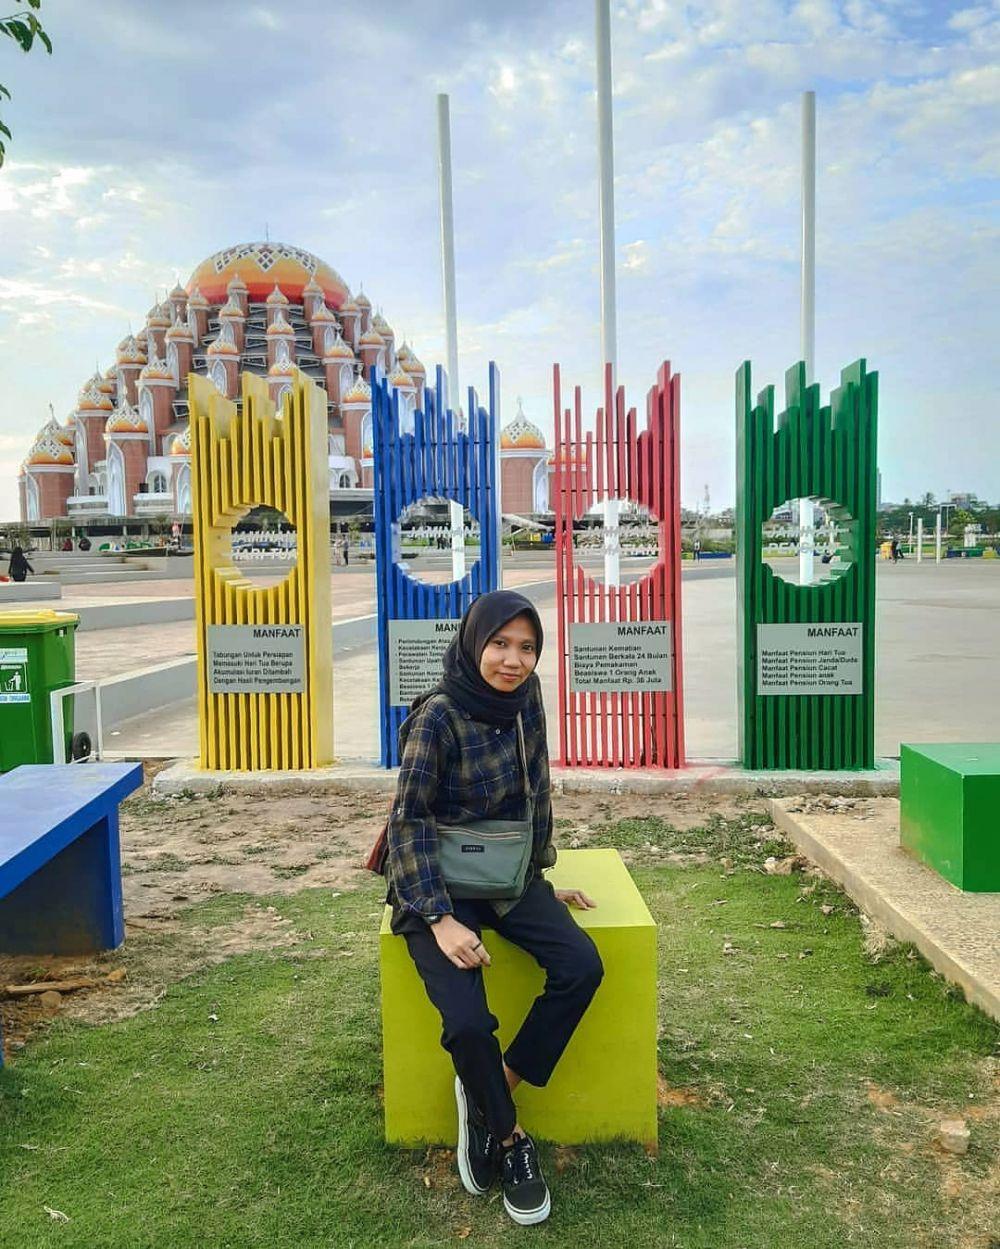 7 Tempat wisata berkonsep syariah di Indonesia © 2019 brilio.net